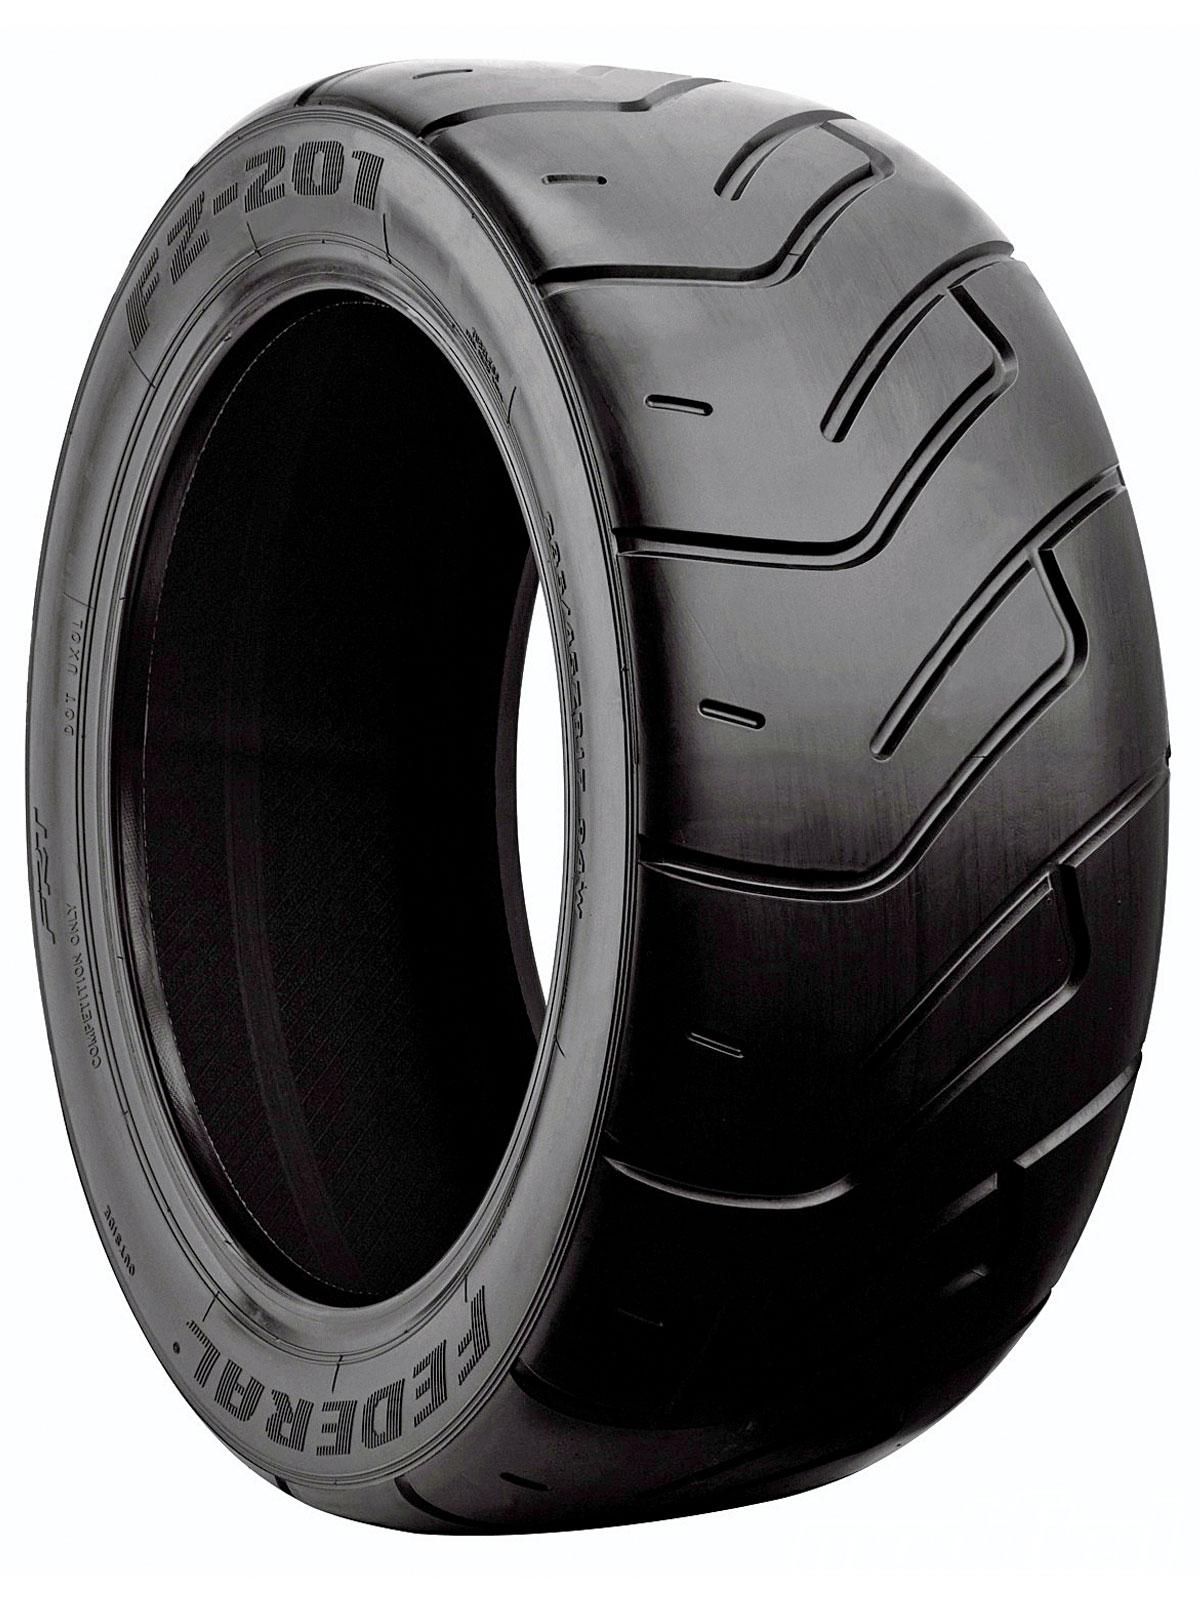 modp_1006_47_o+tire_buyers_guide+federal_fz_201.jpg